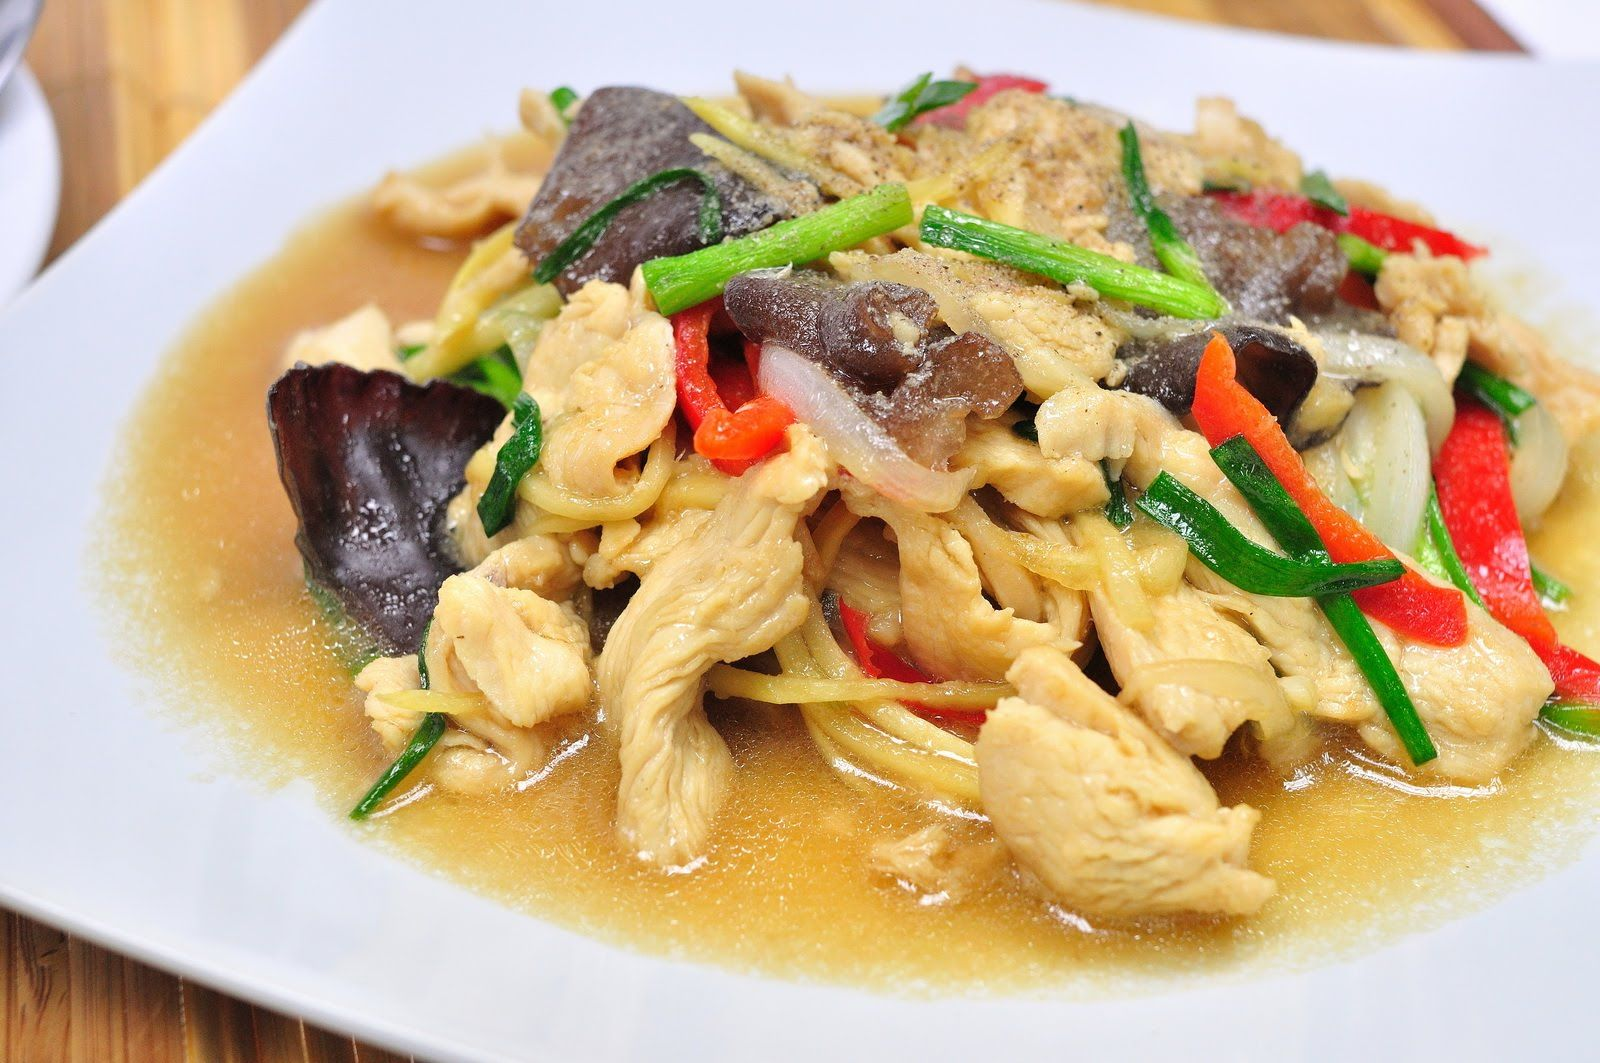 Stir fried chicken with ginger thai food gai pad king stir fried chicken with ginger thai food gai pad king forumfinder Gallery